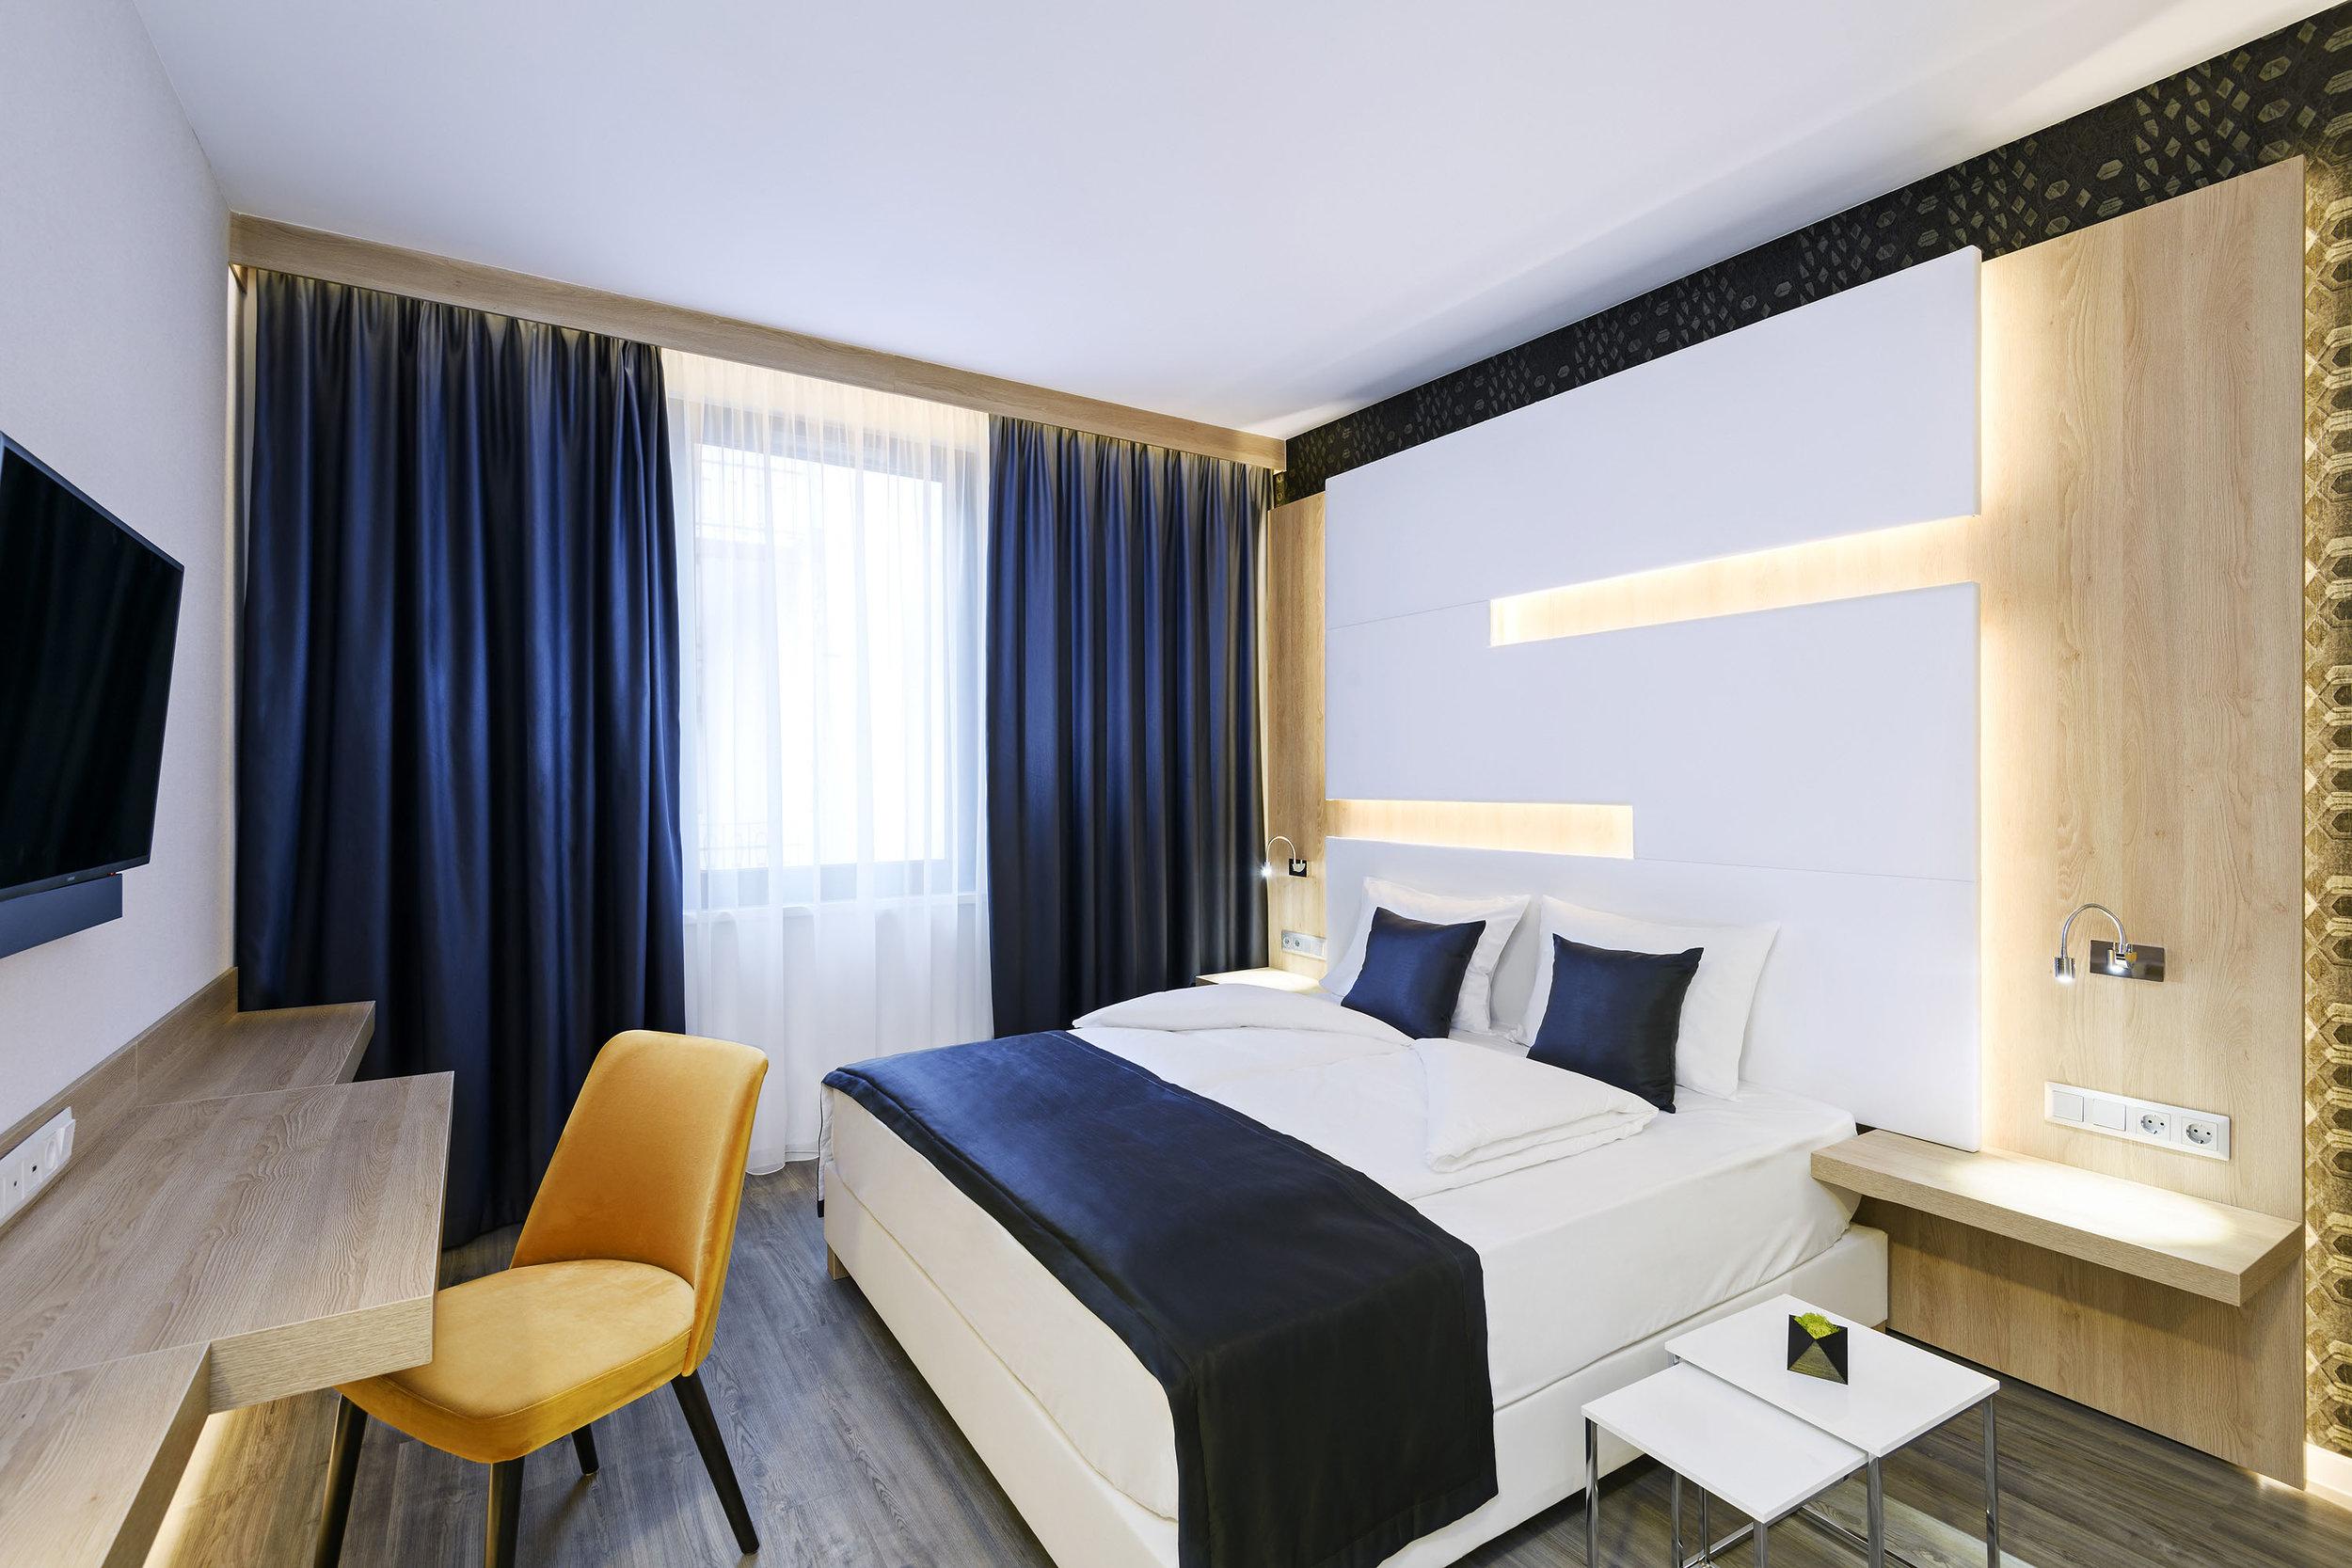 KVI_Hotel_406_03_mod.jpg